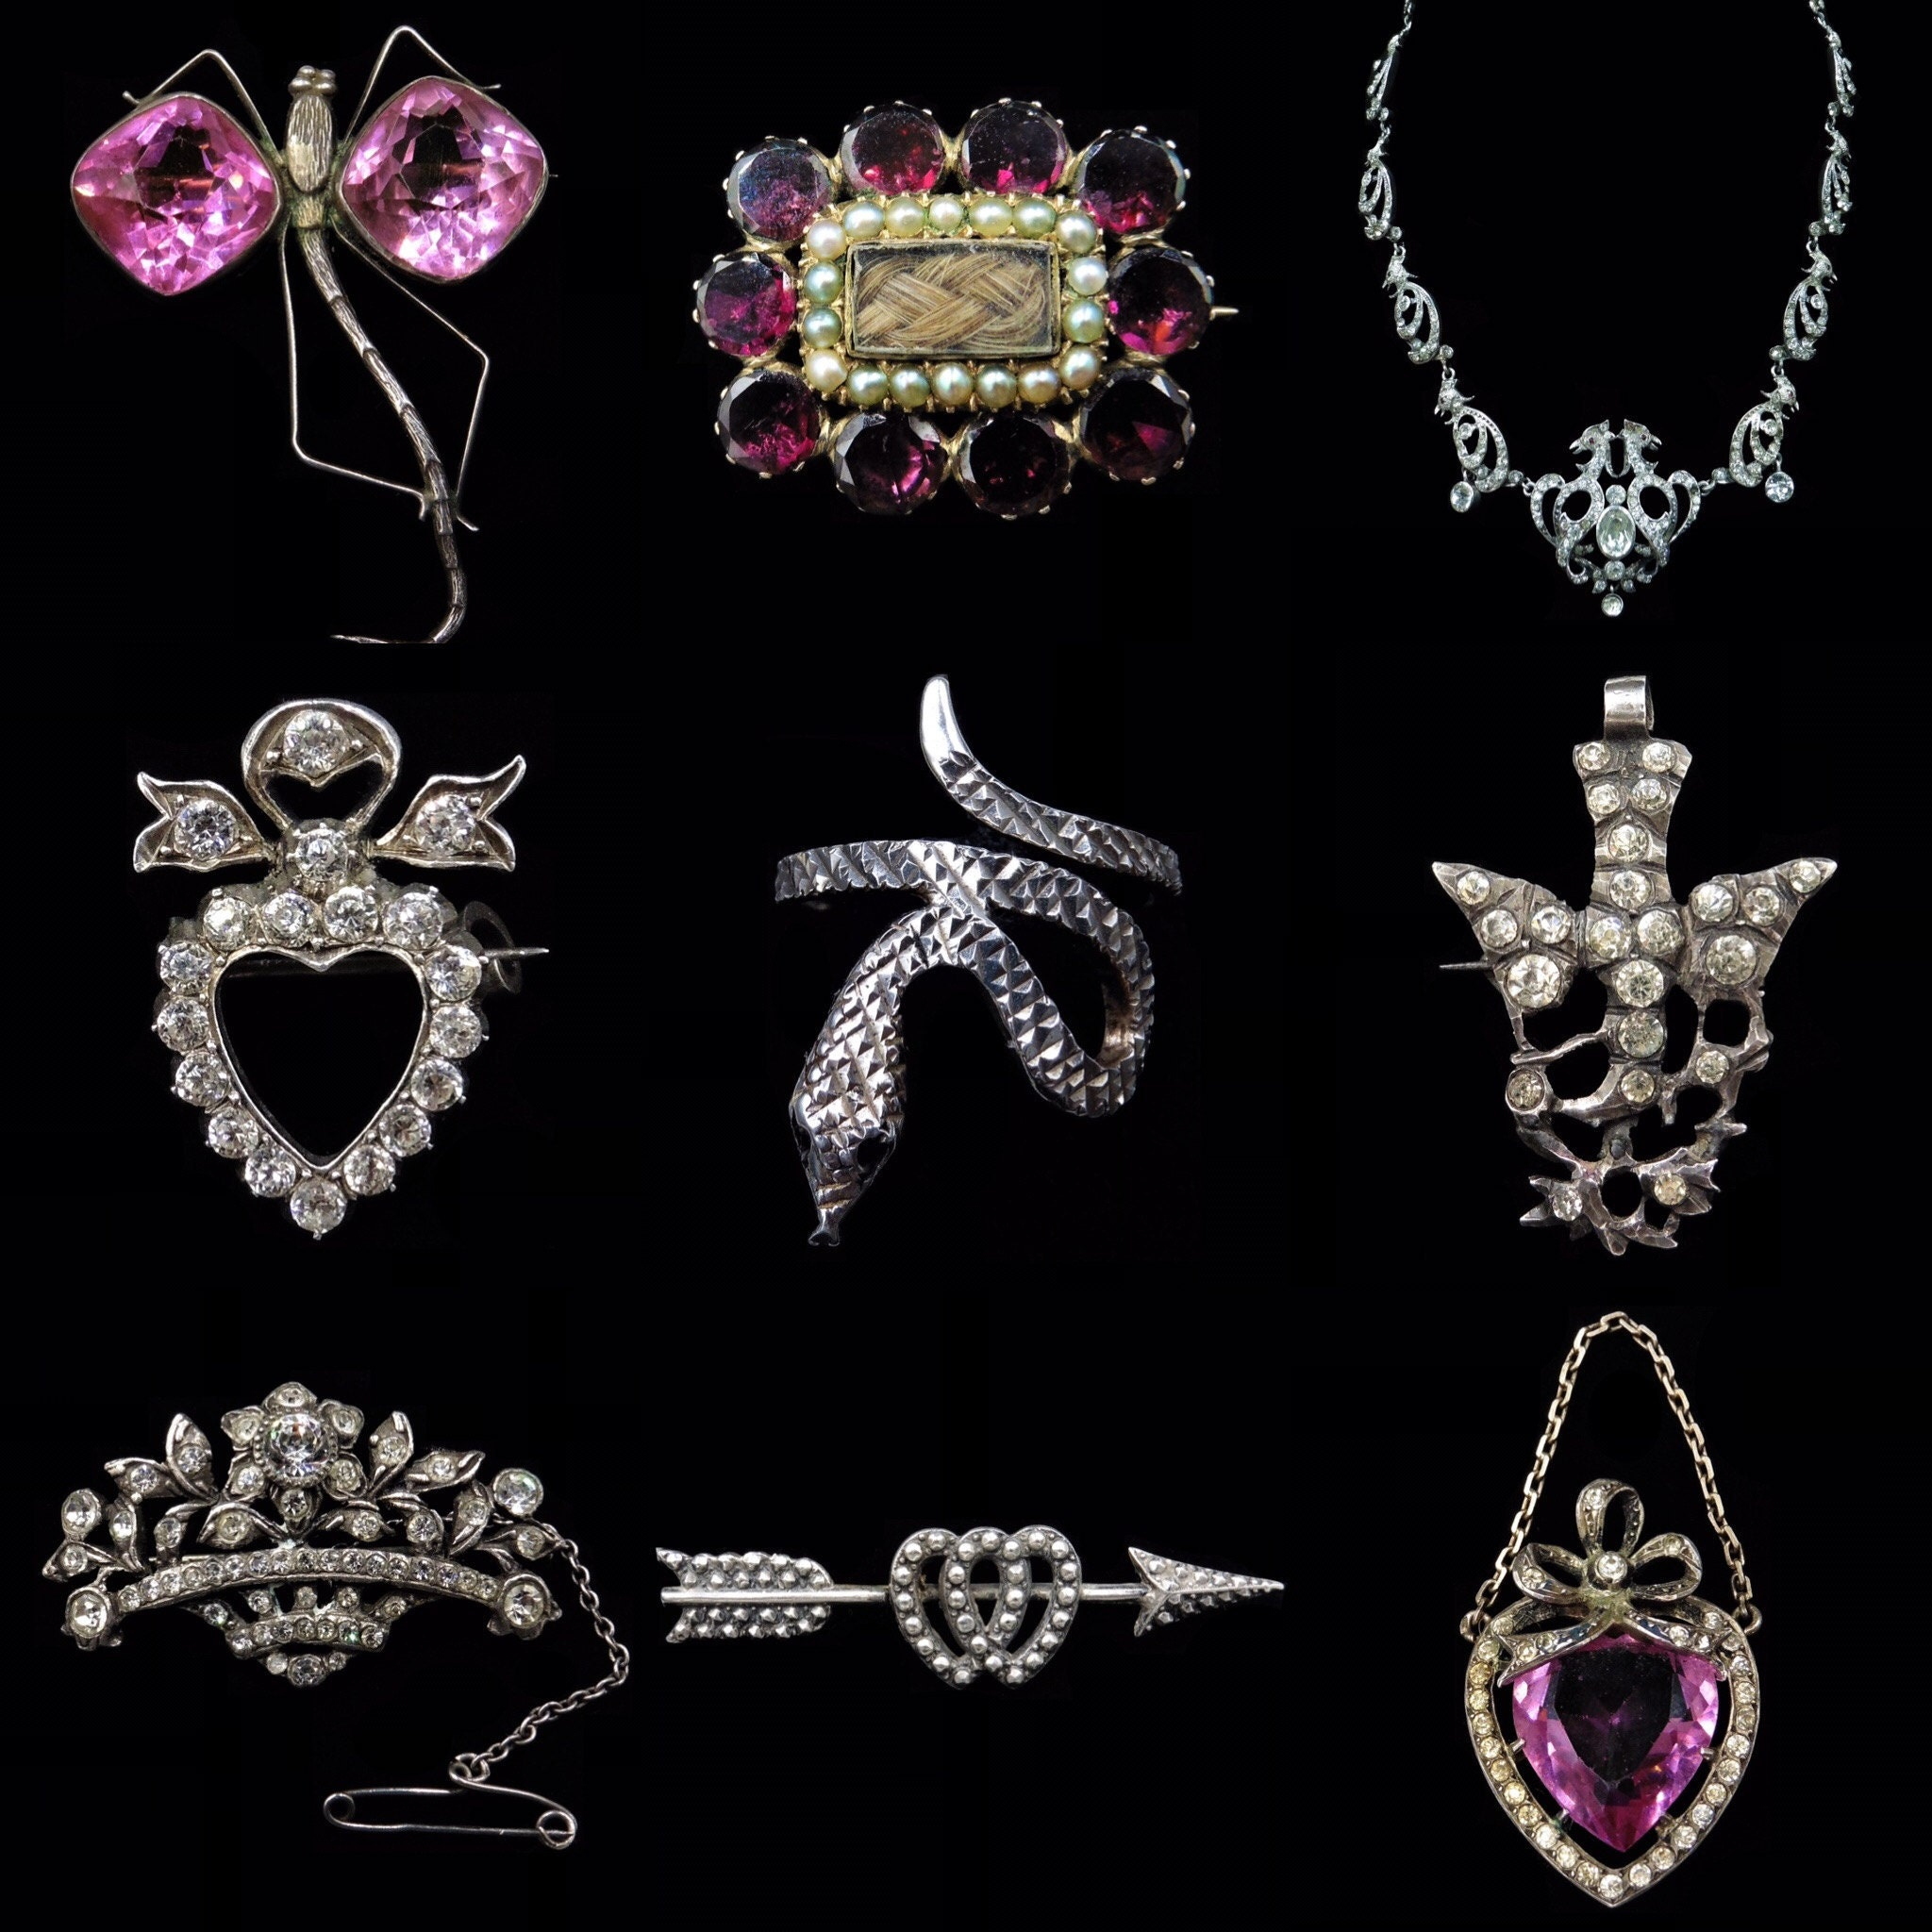 Symbolism in Jewellery